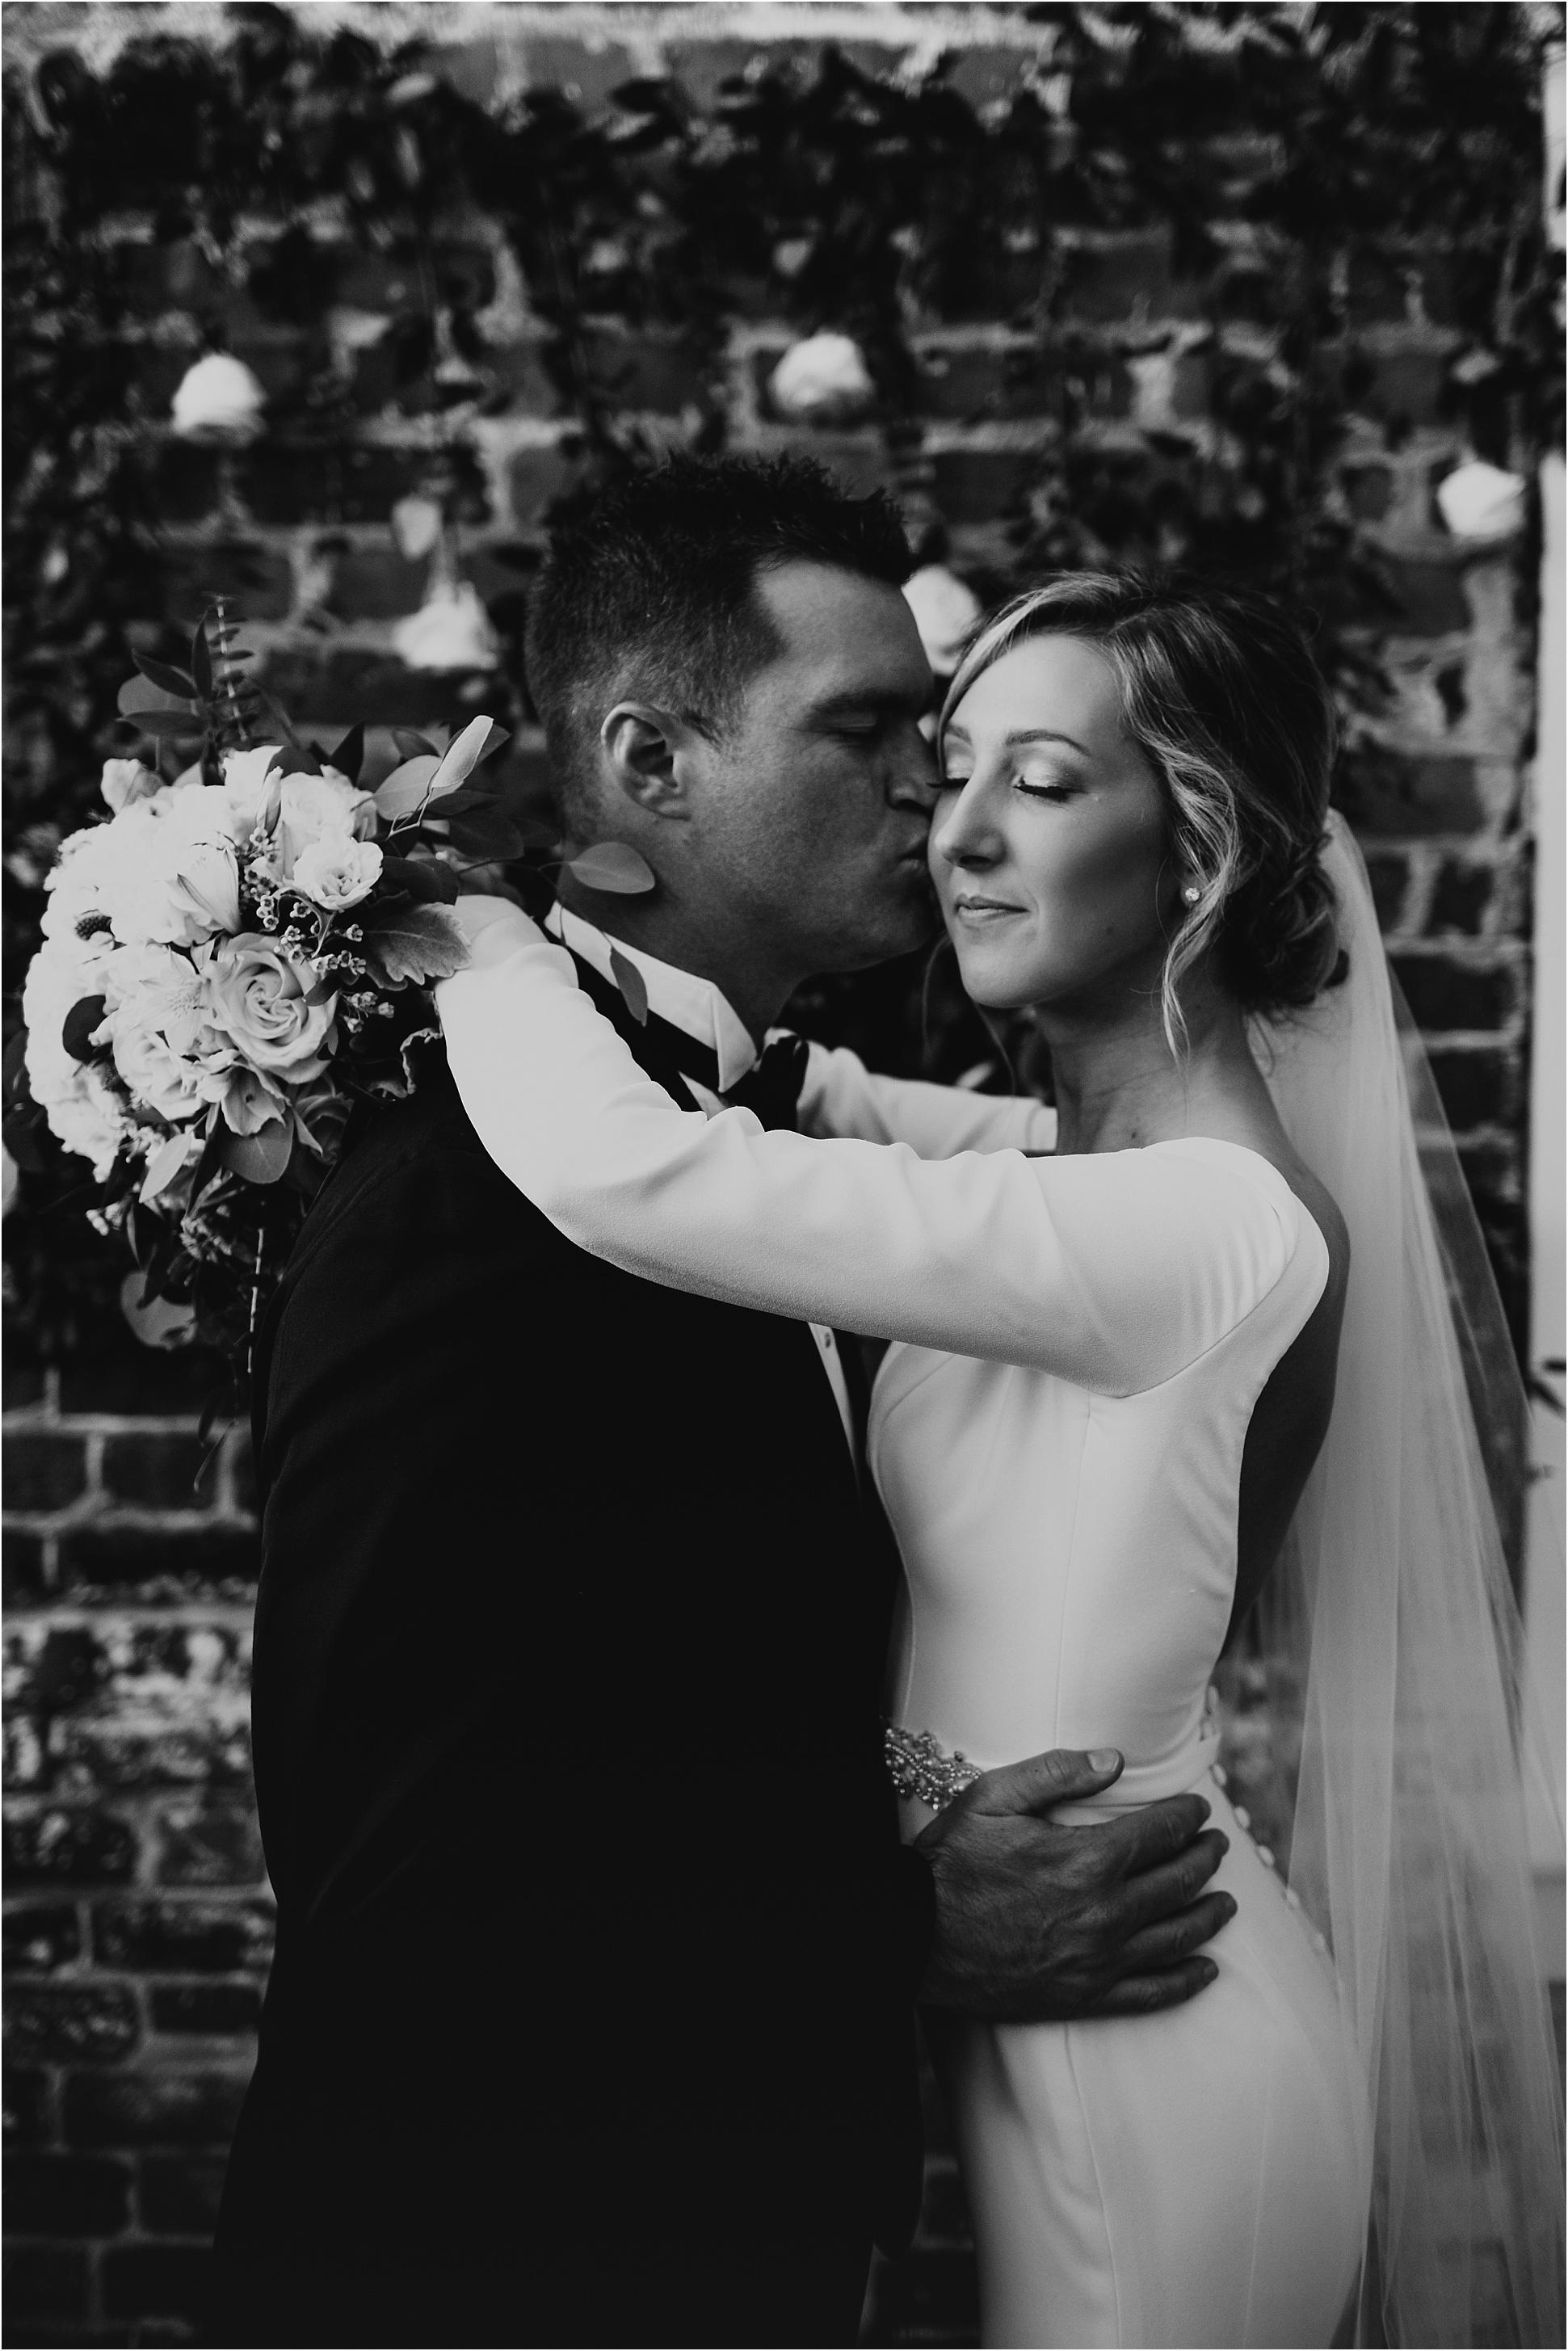 upstairs_midtown_intimate_charleston_wedding052.JPG